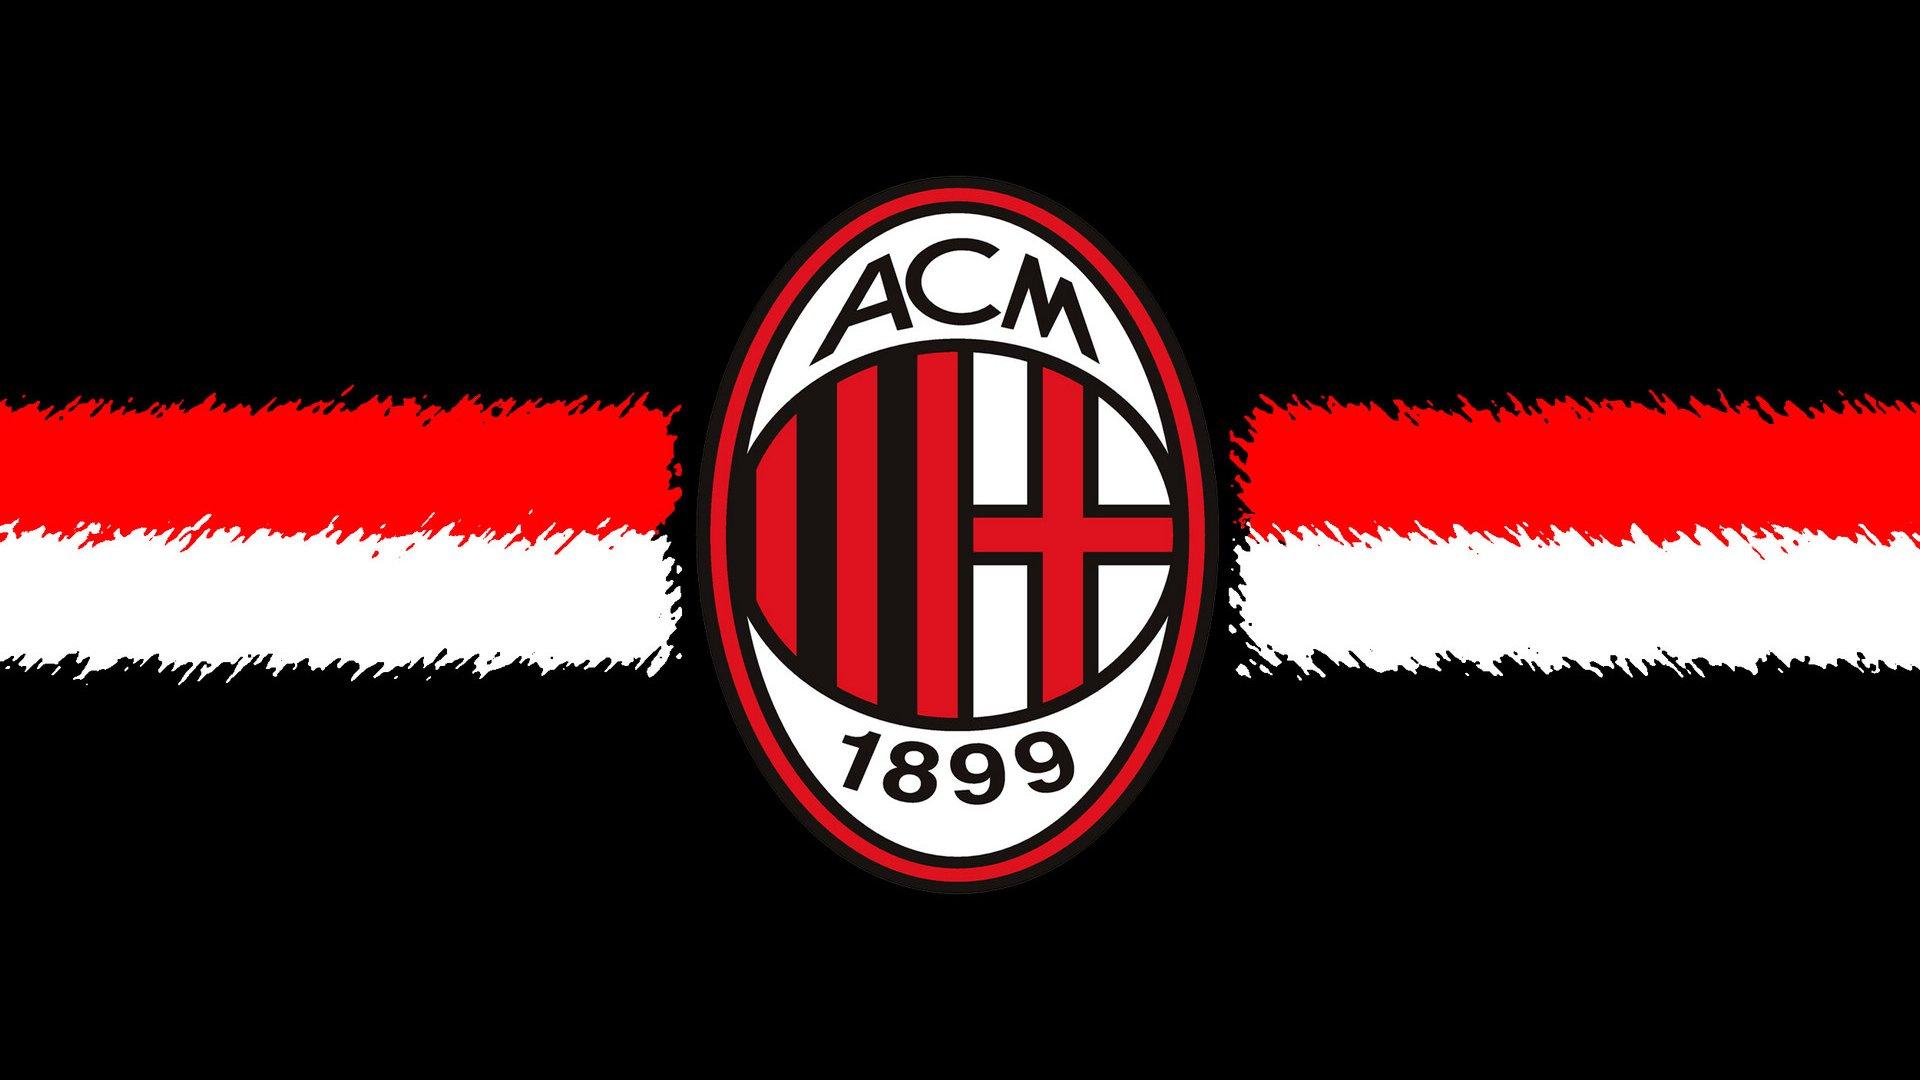 AC Milan Background Football Logo Wallpaper 6748 Wallpaper 1920x1080